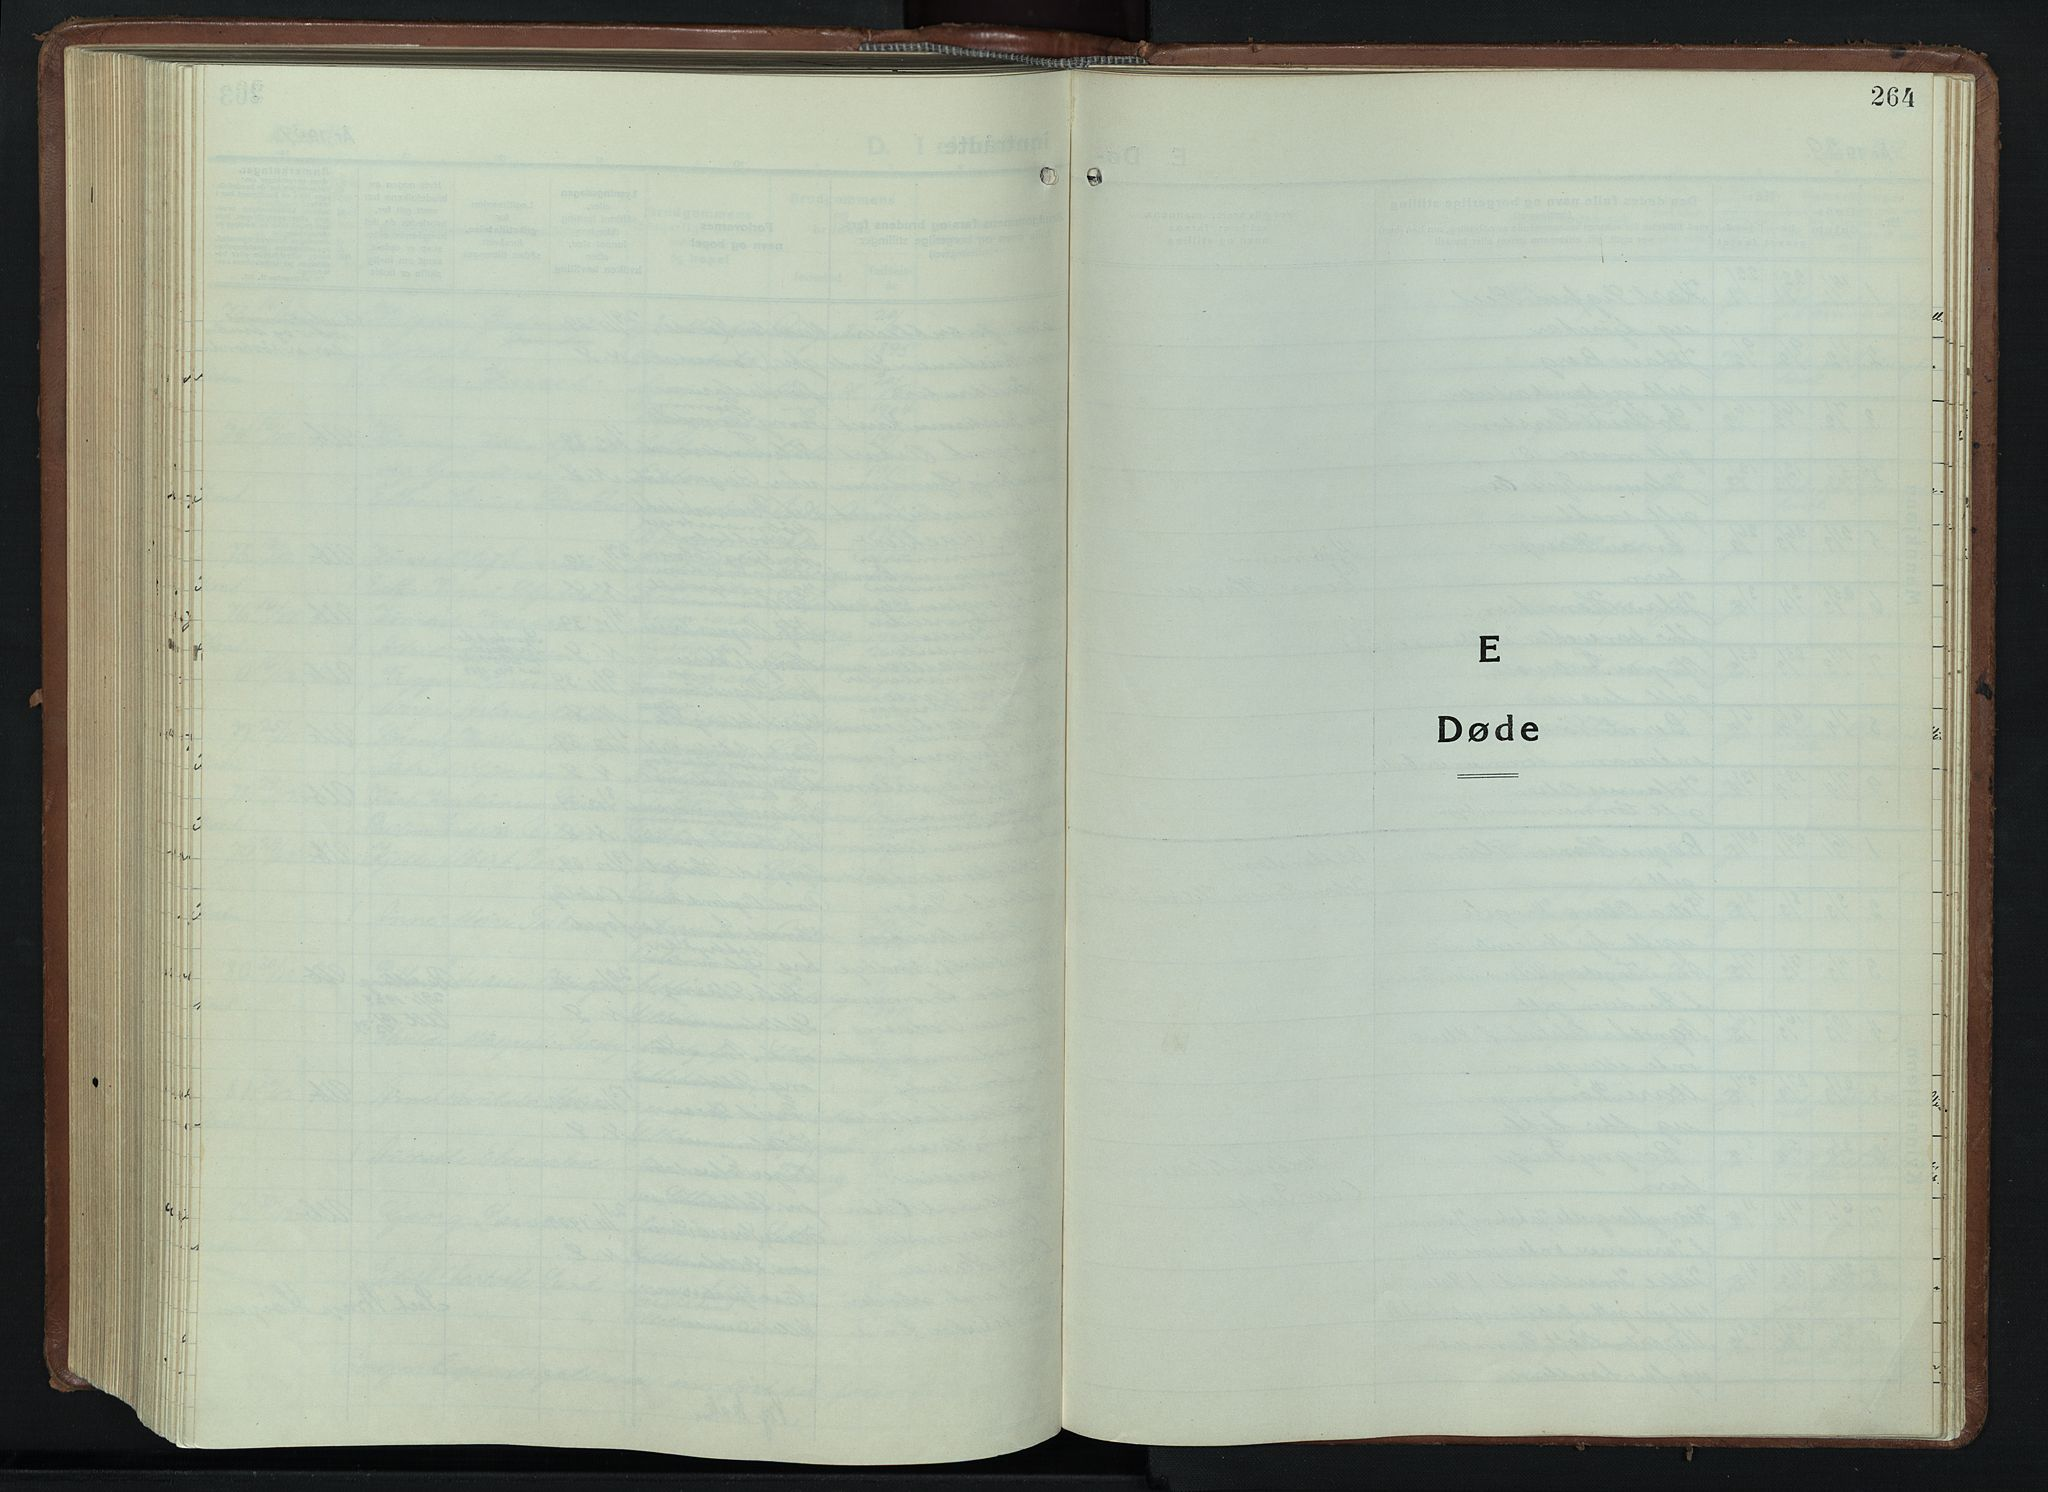 SAH, Lillehammer prestekontor, H/Ha/Hab/L0003: Parish register (copy) no. 3, 1927-1943, p. 264